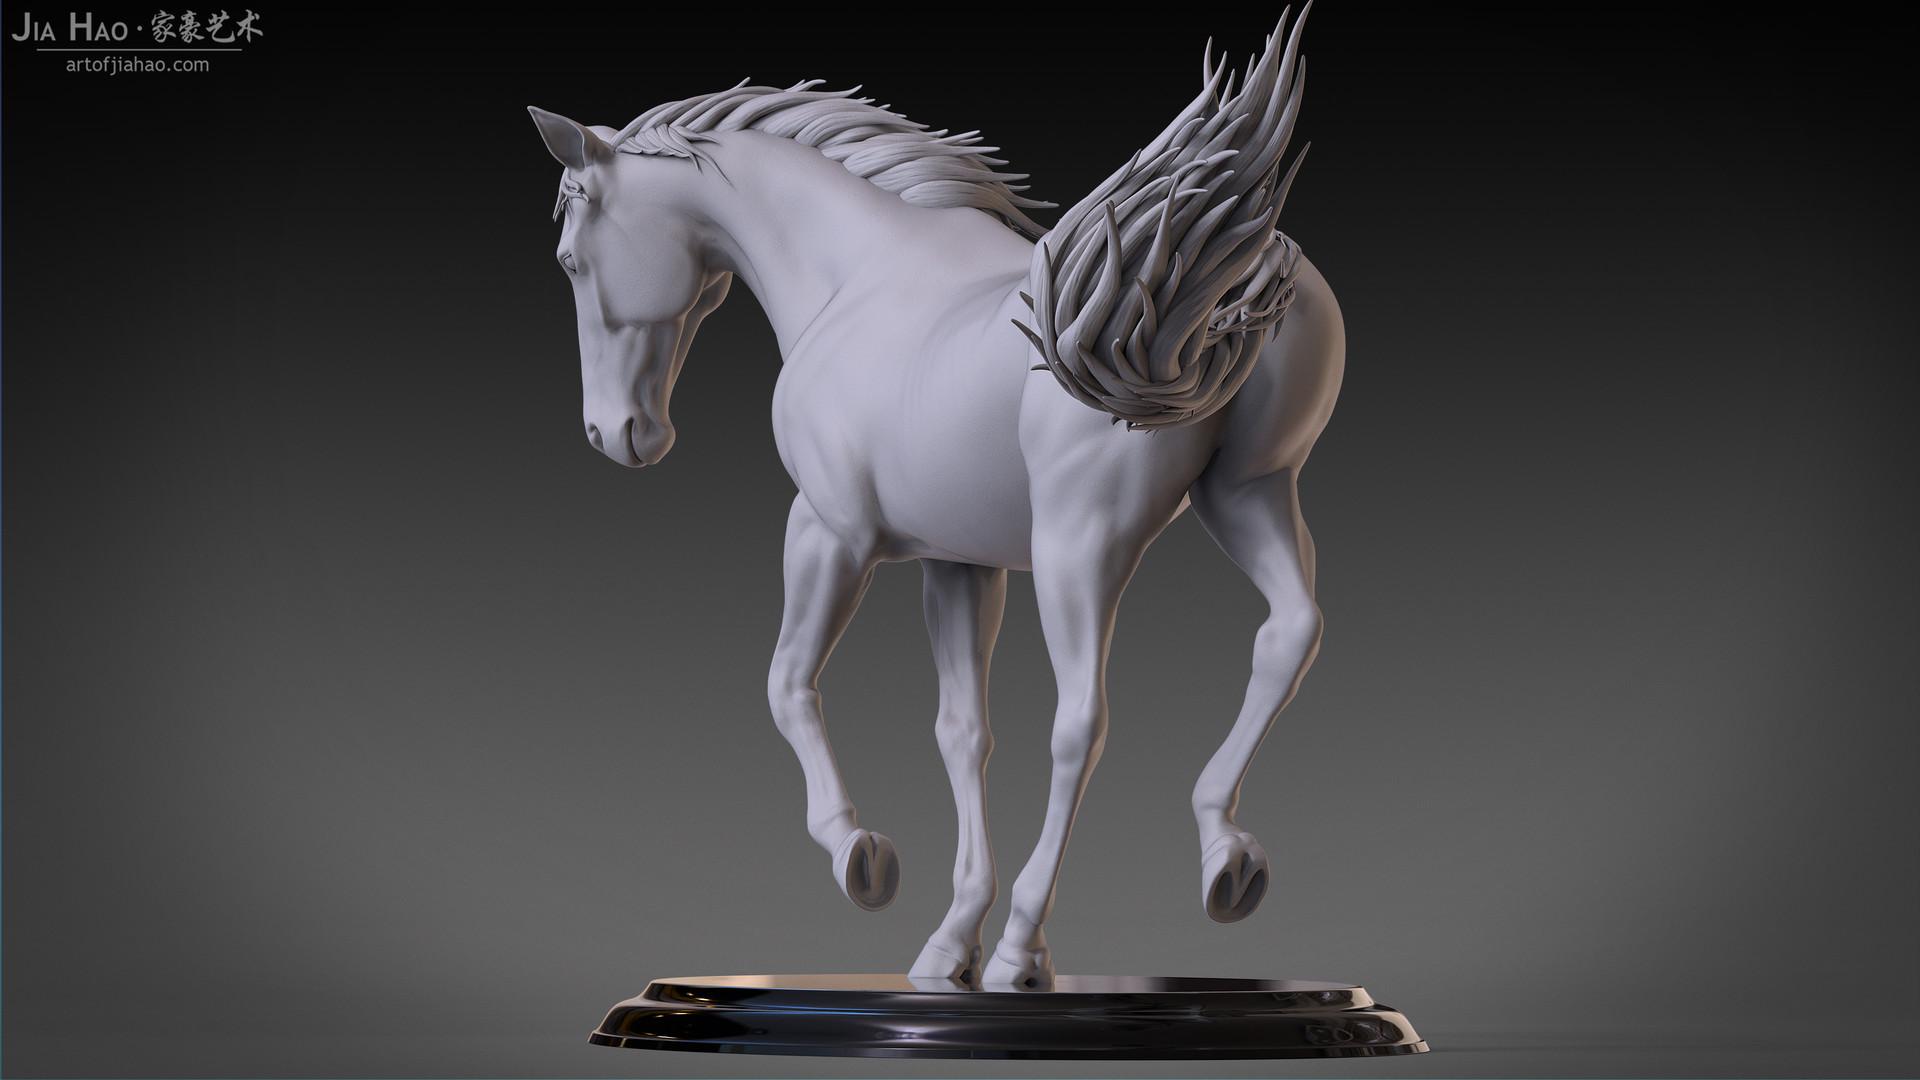 Jia hao horse sculpture comp clay 03